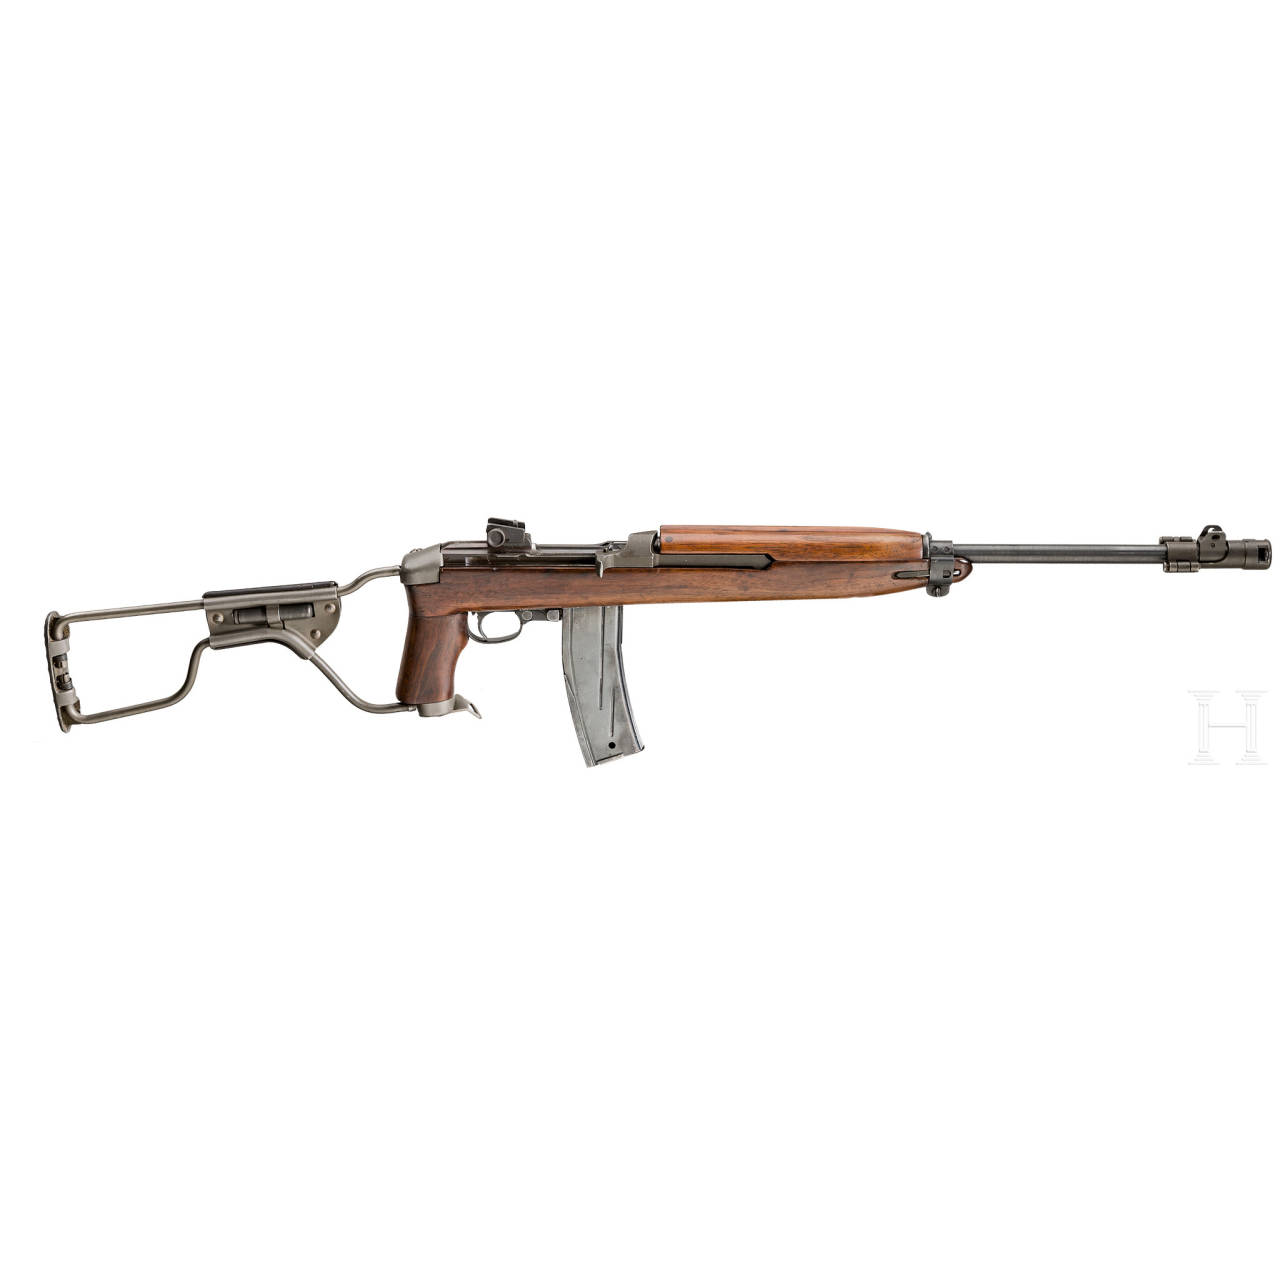 Carbine .30 M1 A1